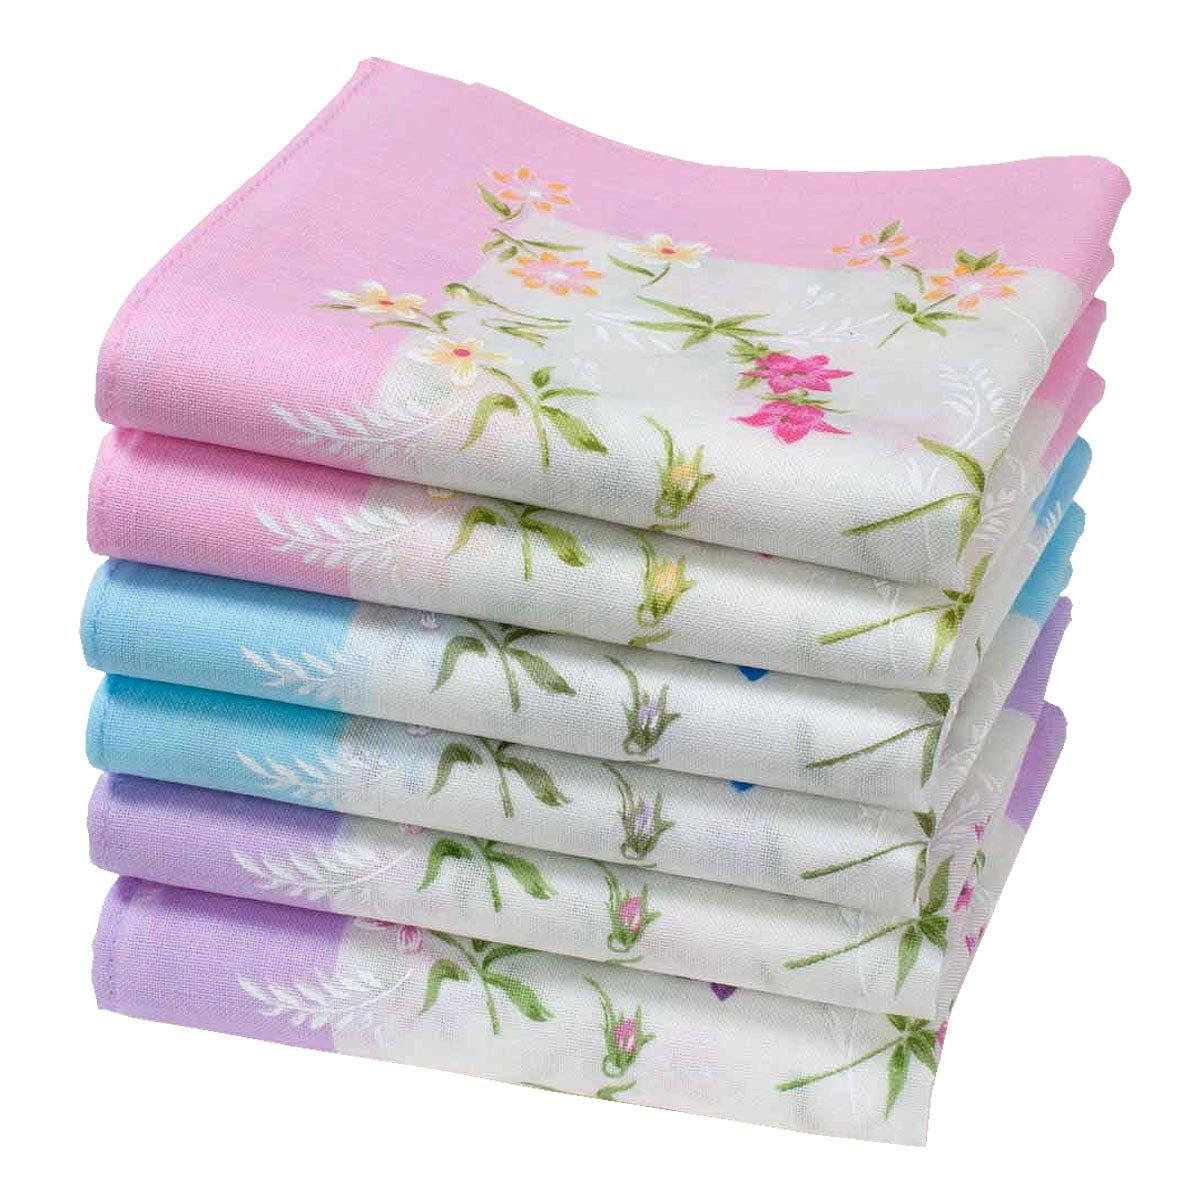 "Abby handkerchiefs for ladies - 14"" square - 6 units Merrysquare"